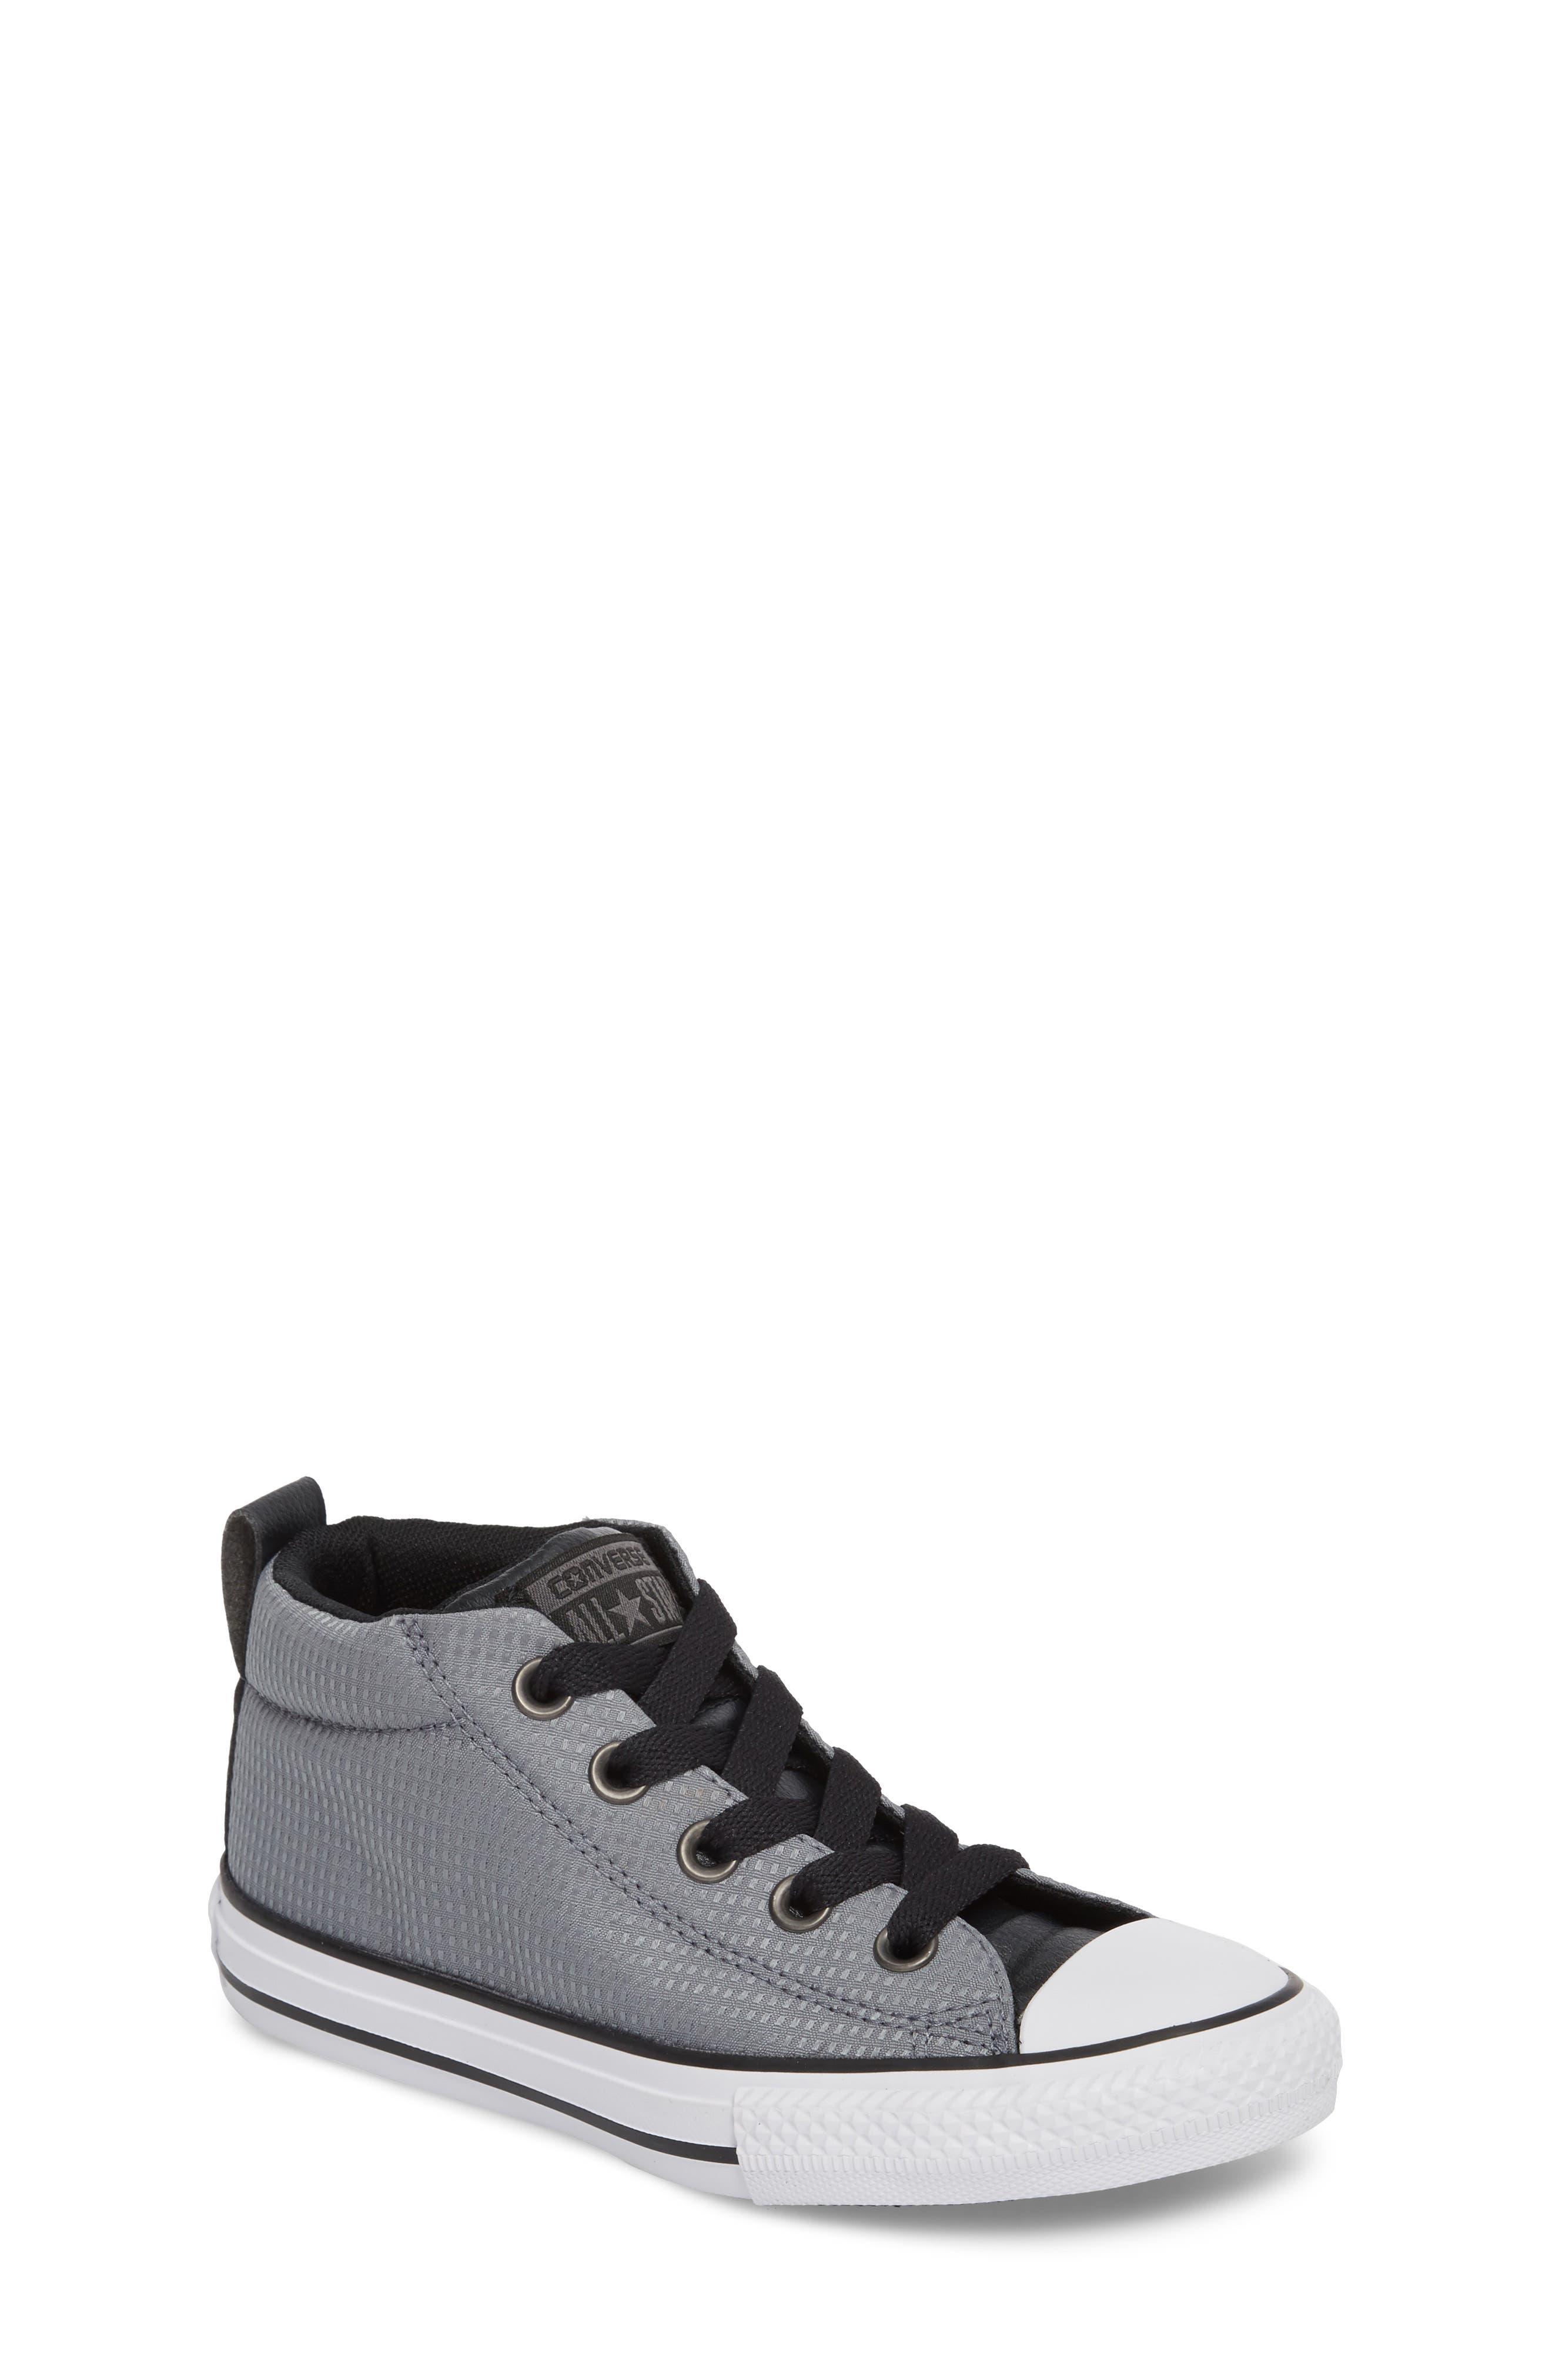 Alternate Image 1 Selected - Converse Chuck Taylor® All Star® Street Mid Backpack Sneaker (Baby, Walker, Toddler, Little Kid & Big Kid)